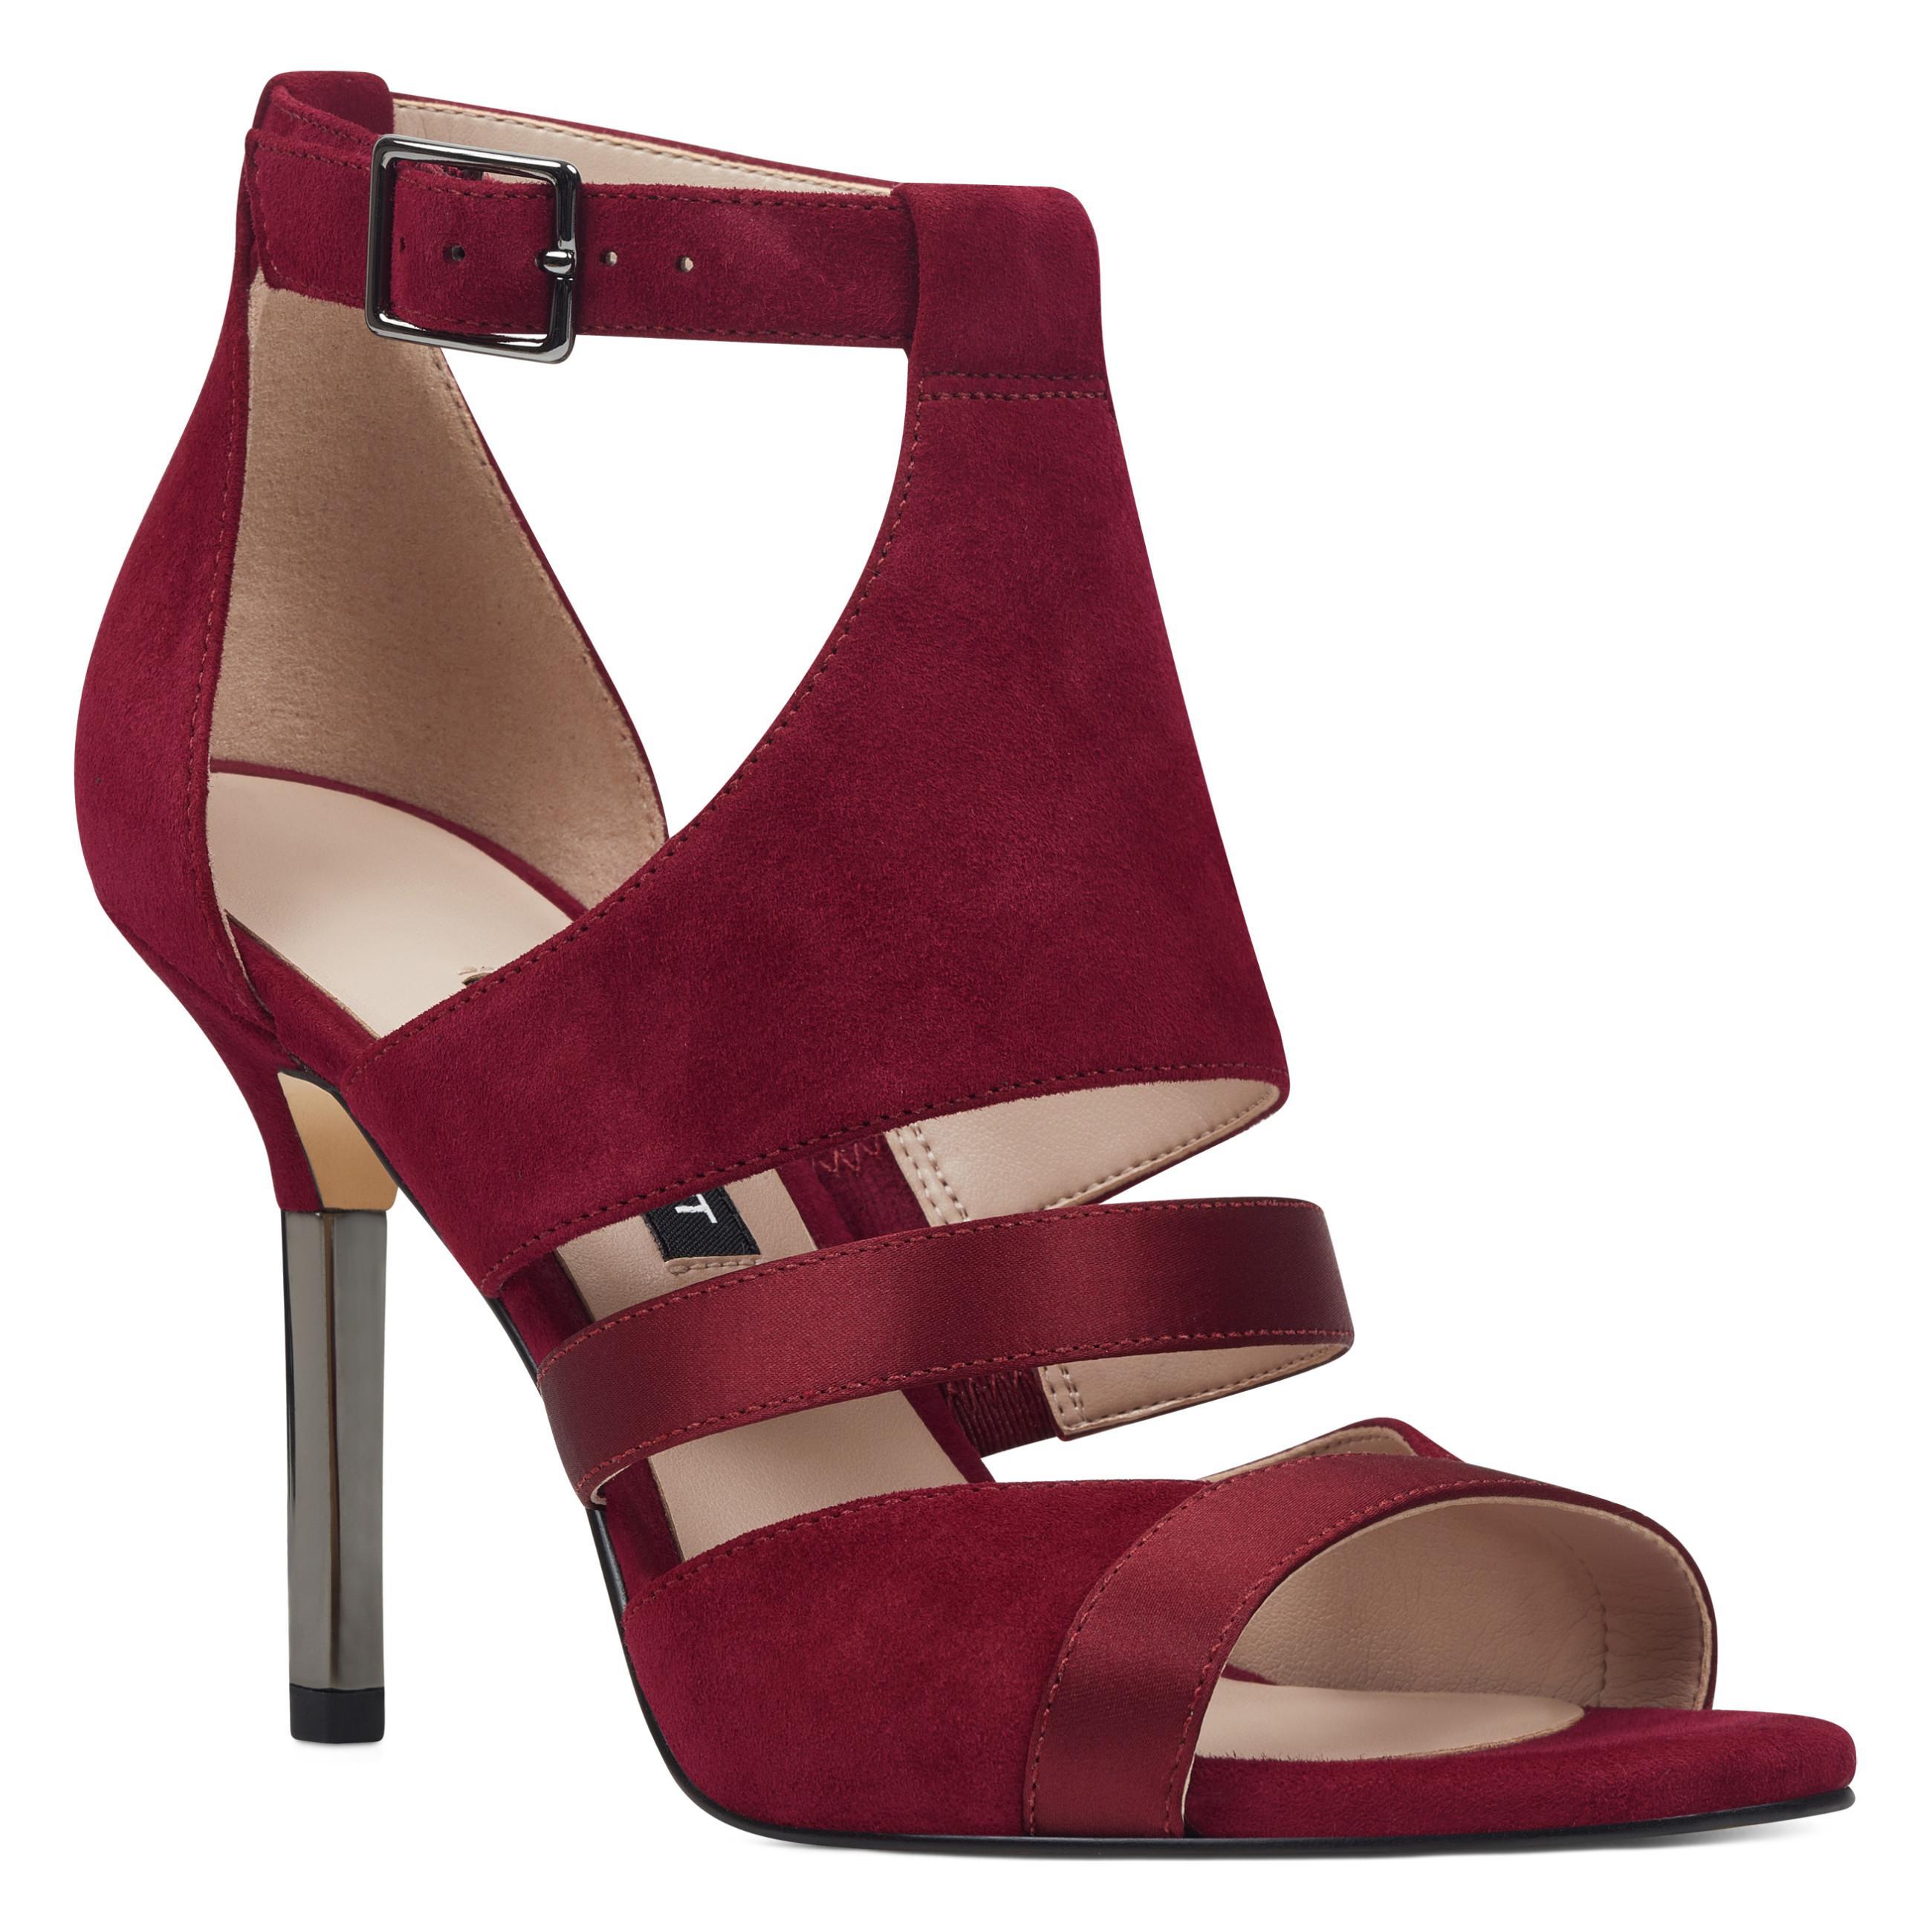 f1367c01c2c229 Nine West - Red Brianna Caged Sandals - Lyst. View fullscreen